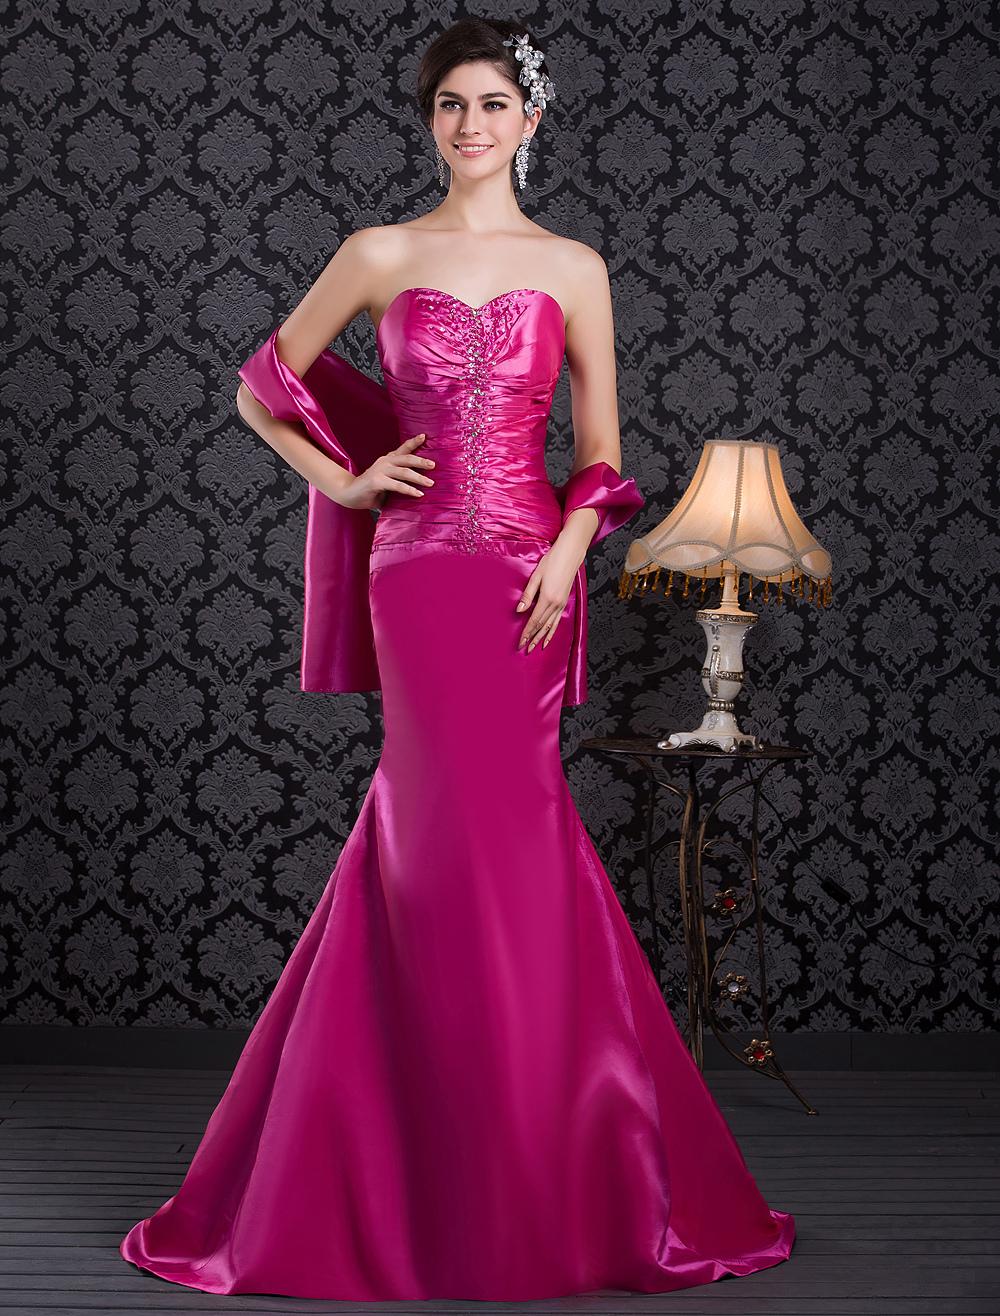 Formal Fuchsia Sweetheart Neck Mermaid Evening Dress